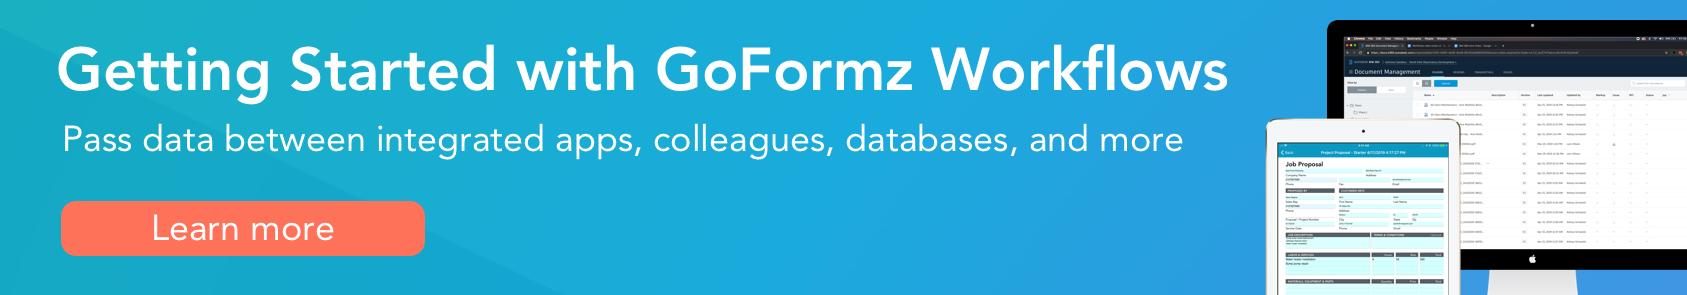 Banner text: Getting Started with GoFormz Workflows